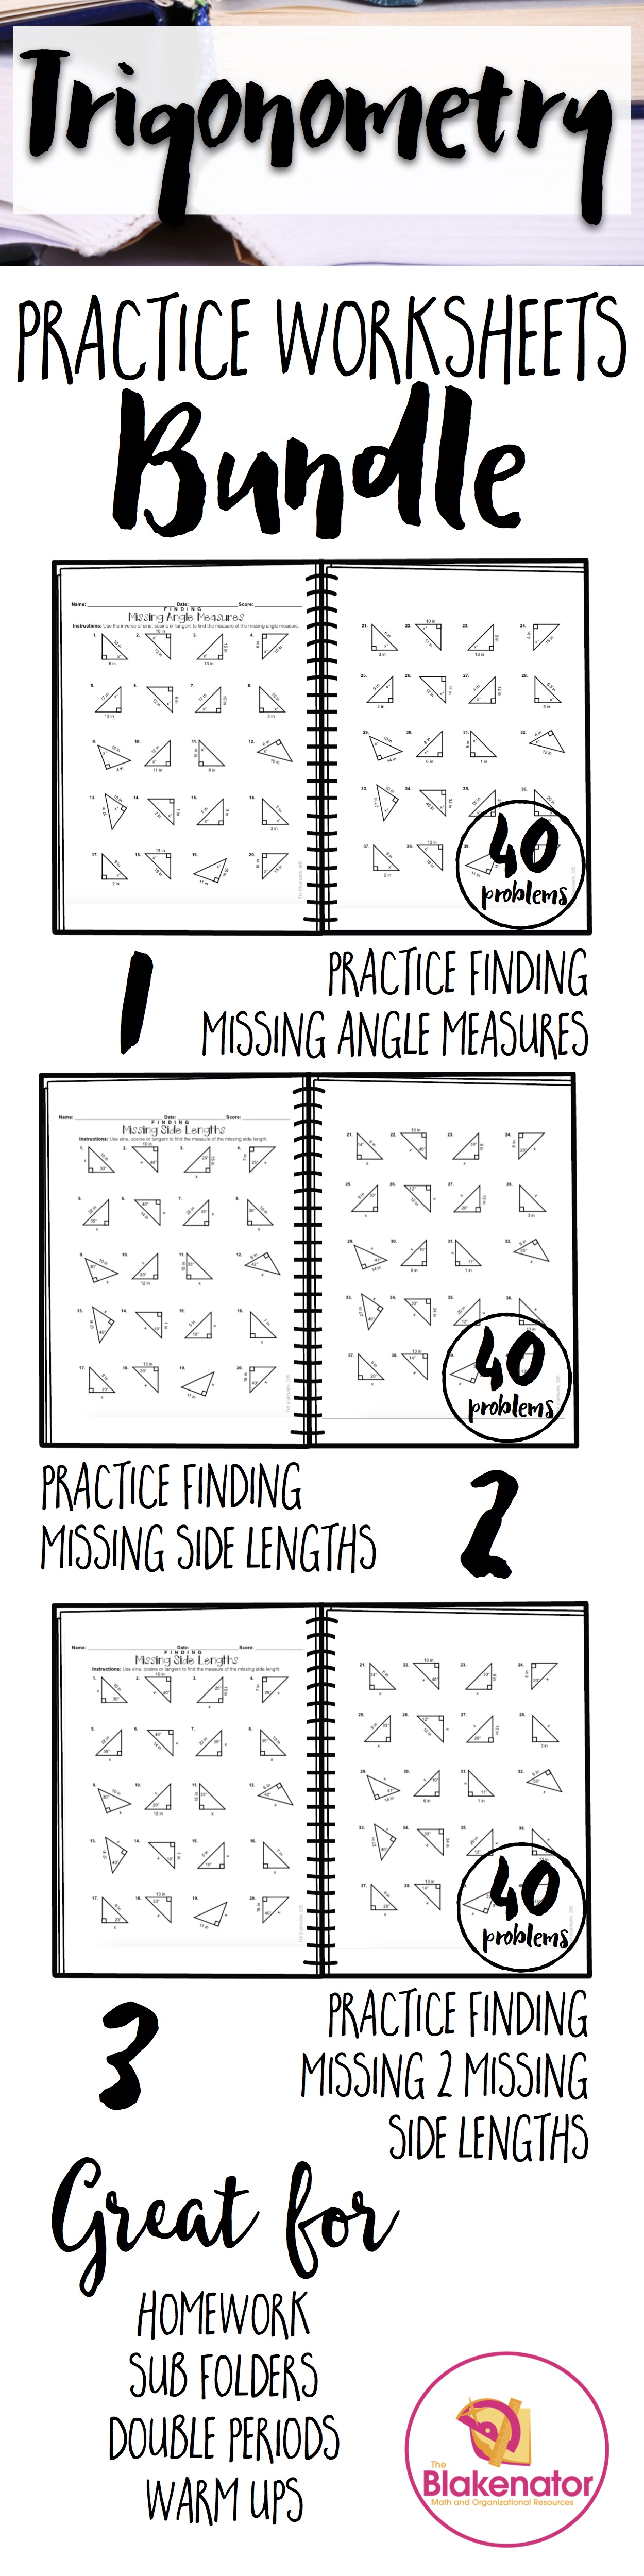 Trigonometry Worksheet Bundle 120 Practice Problems Trigonometry Worksheets Middle School Math Secondary Math